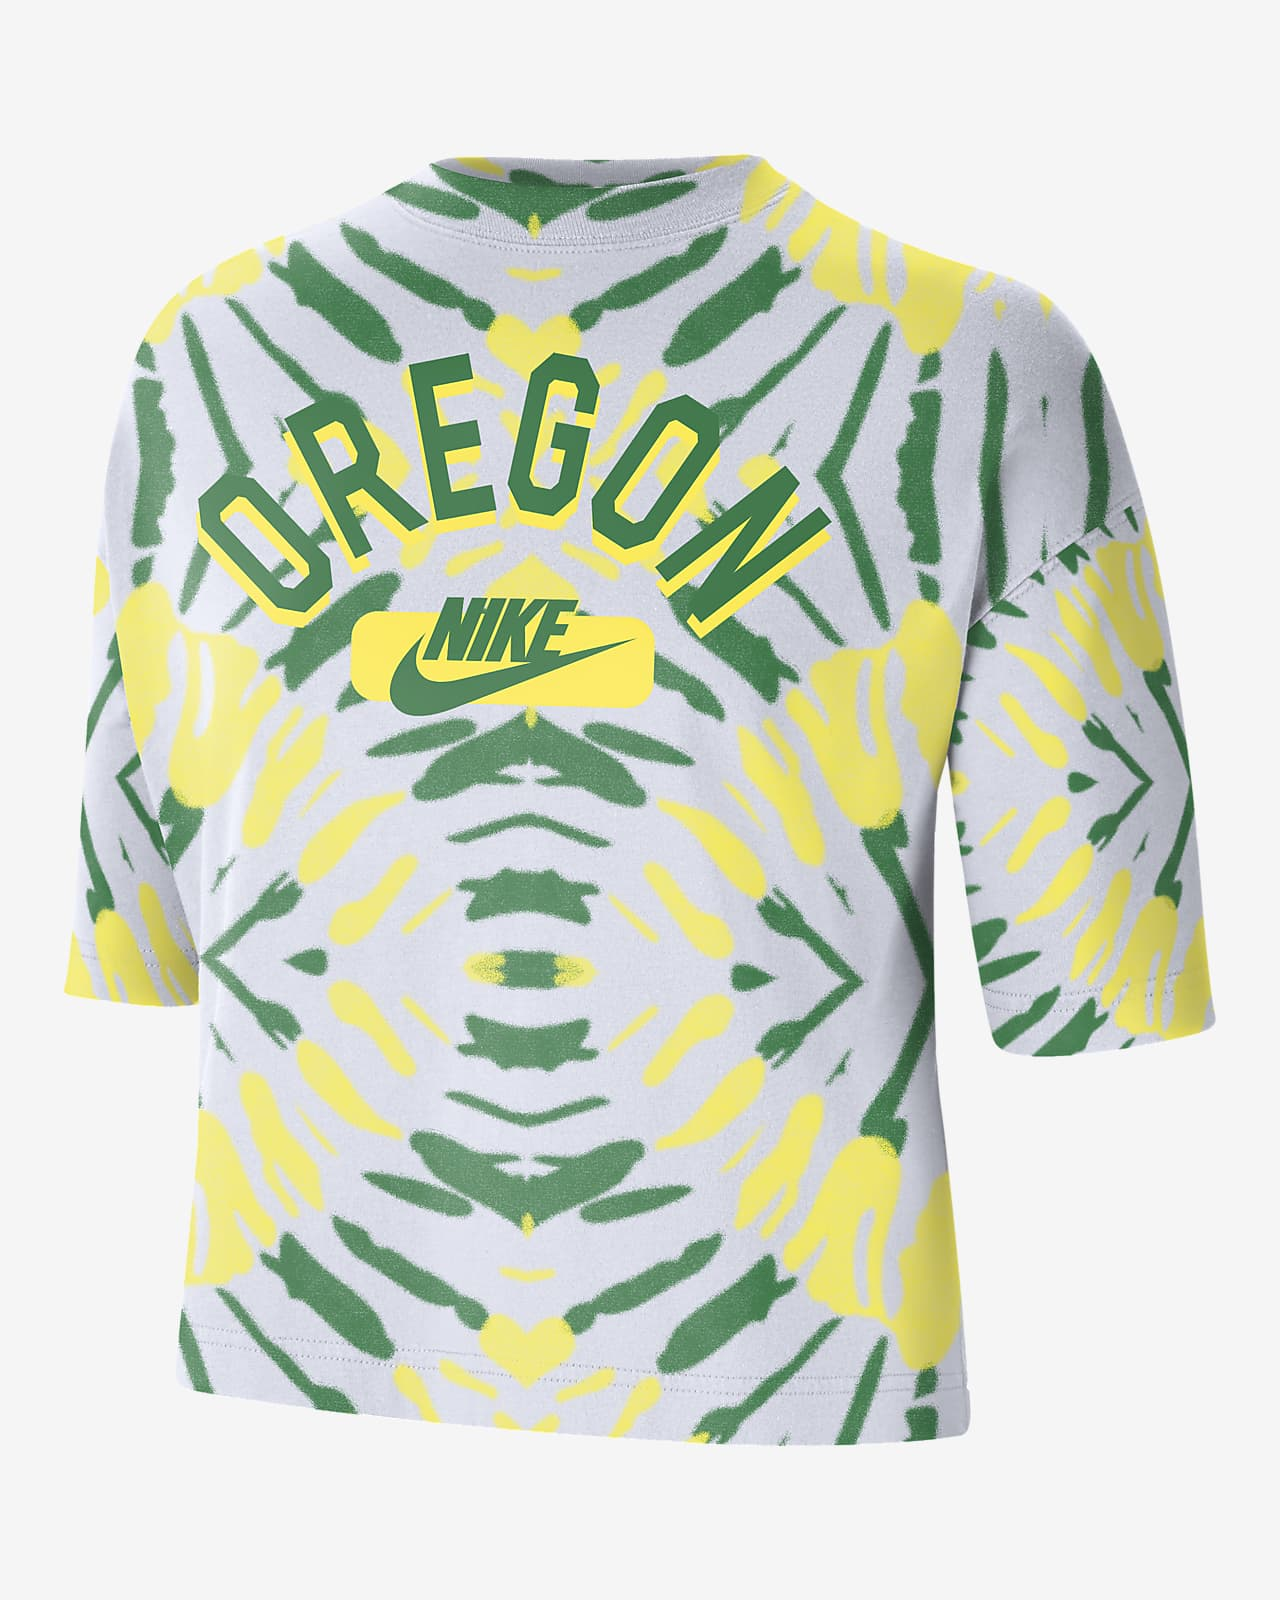 Nike College (Oregon) Women's Boxy Printed T-Shirt